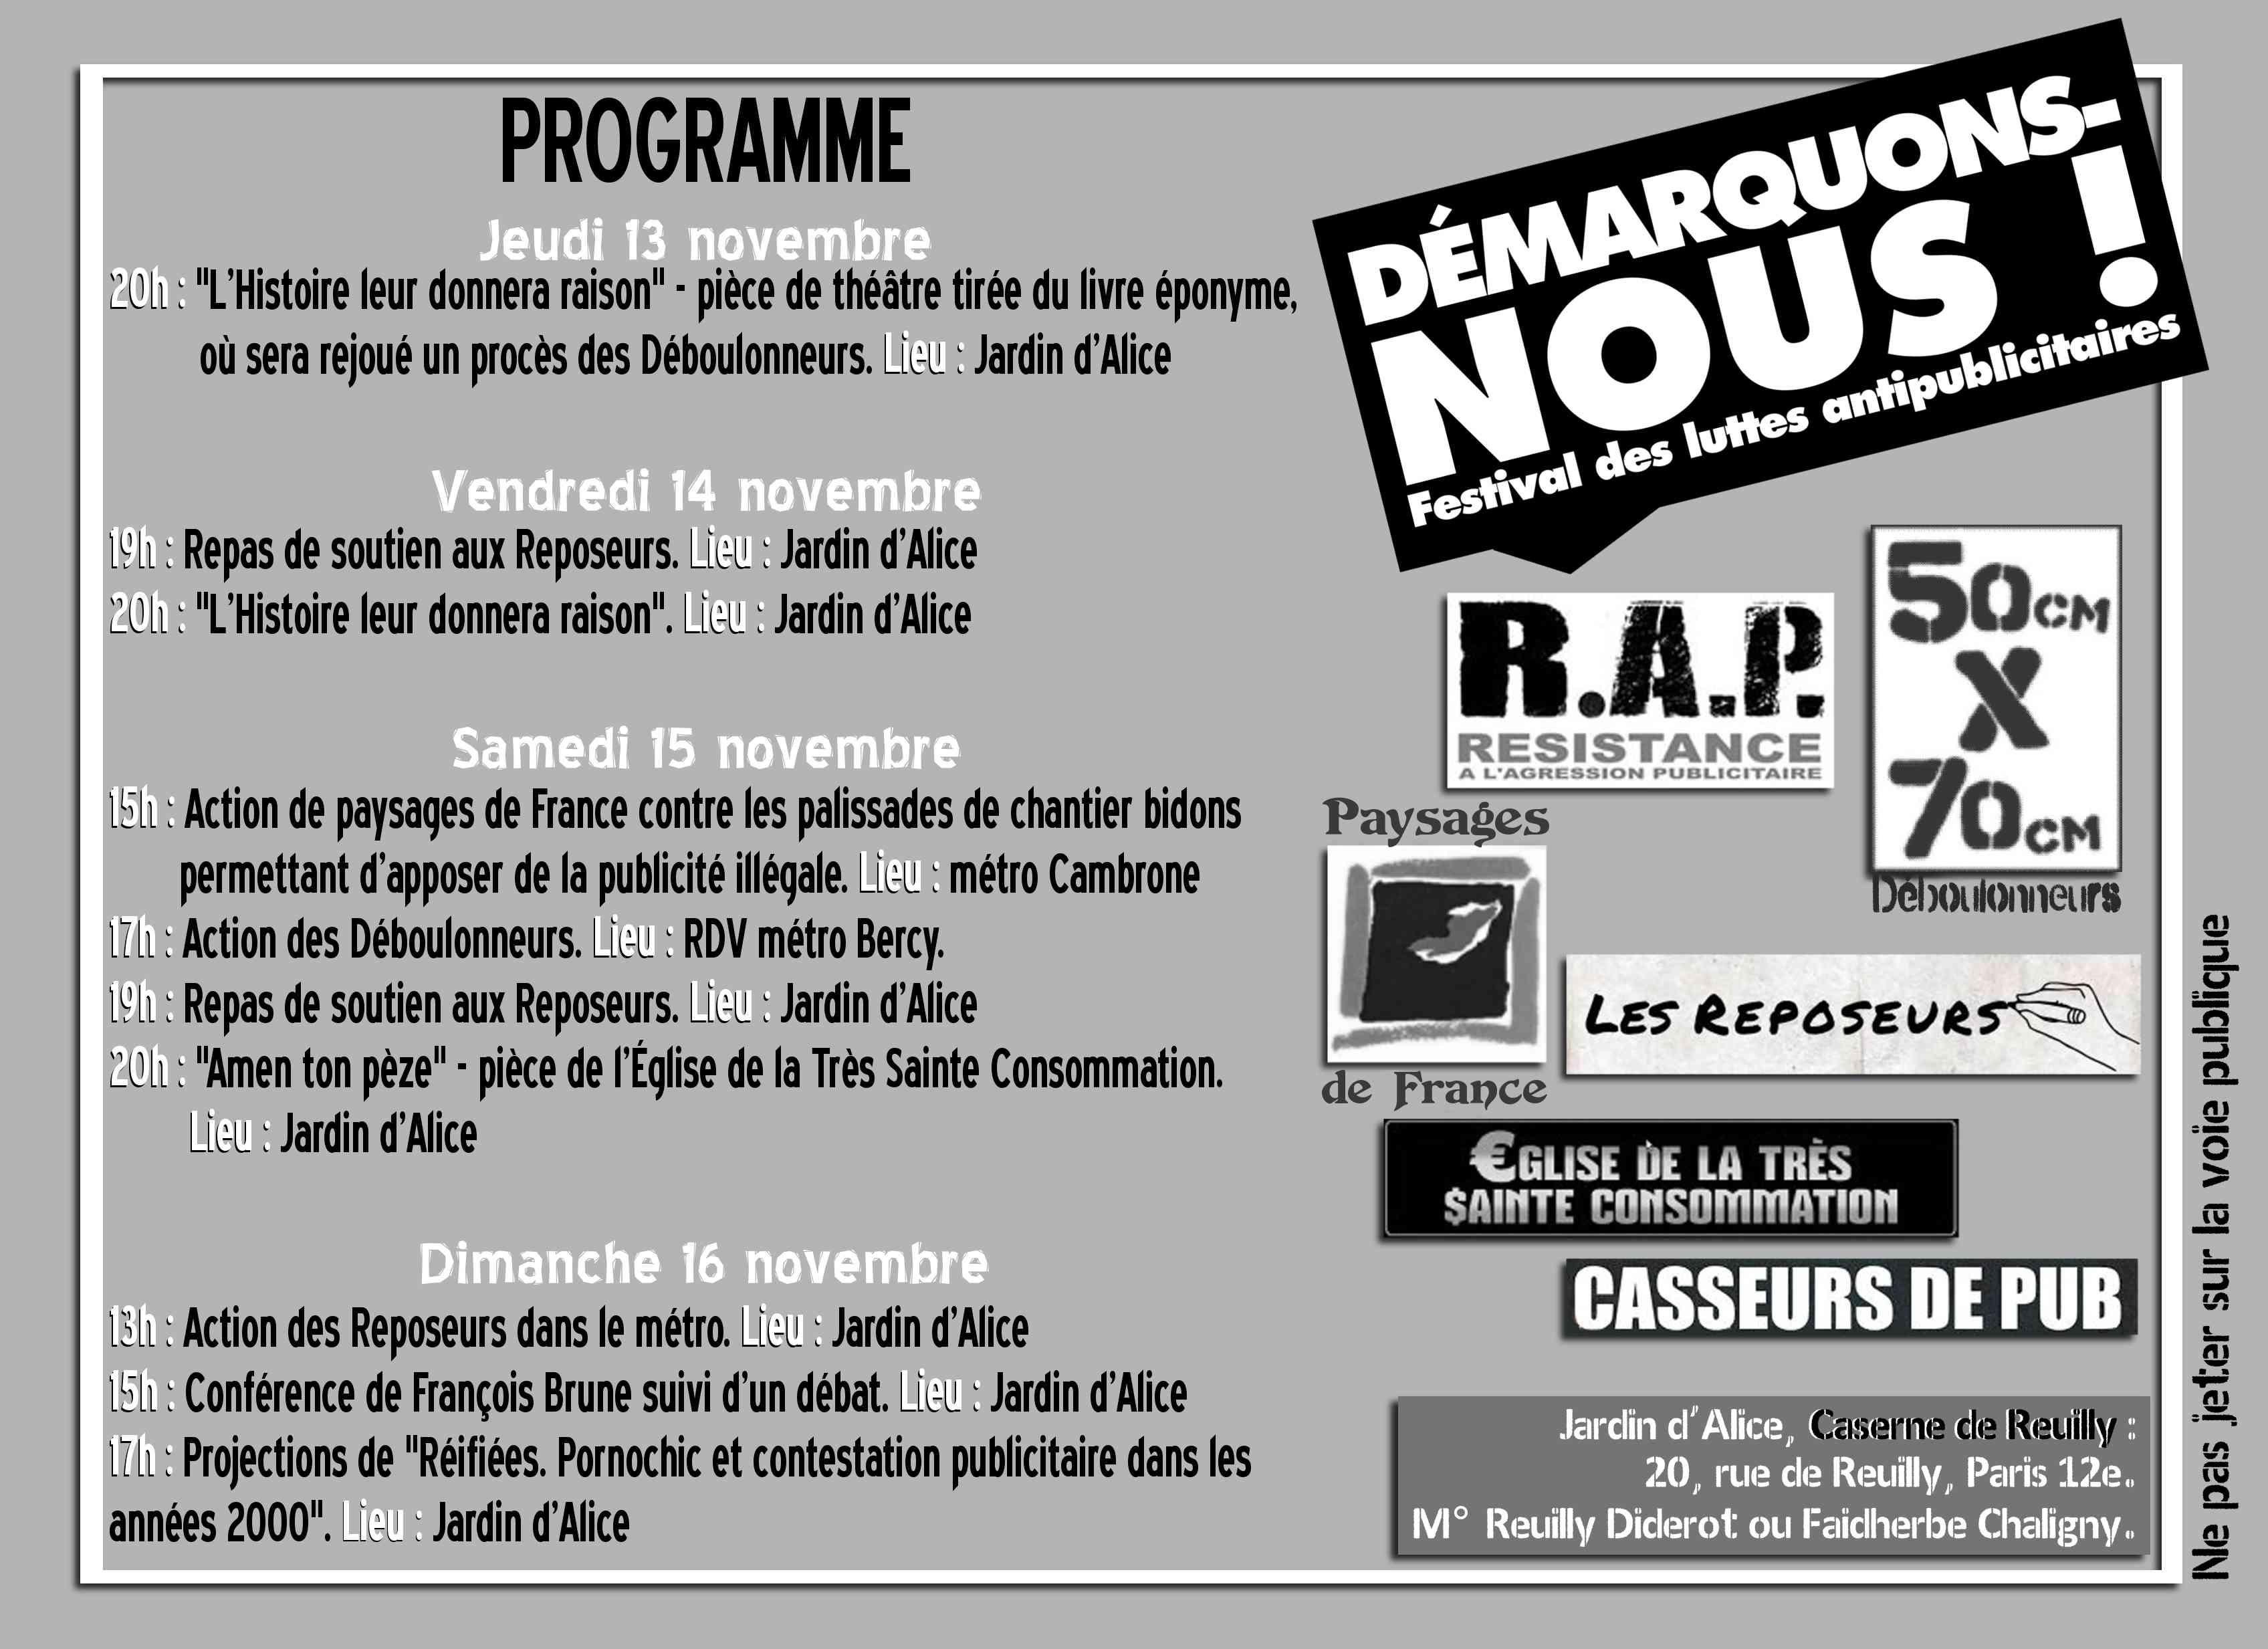 Verso_Programme_DemarquonsNous_BD.jpg